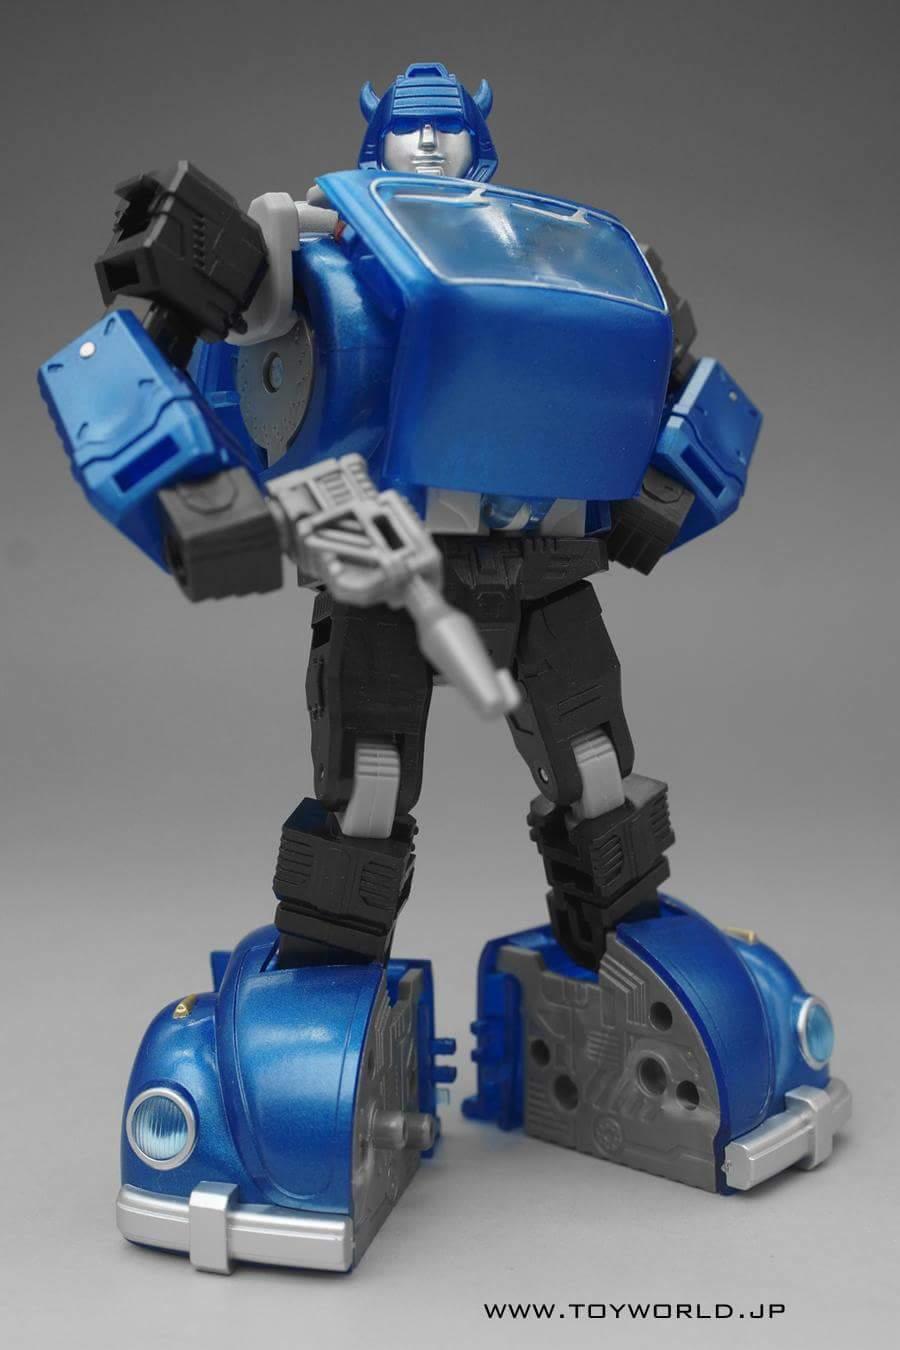 [Toyworld][Zeta Toys] Produit Tiers - Minibots MP - Gamme EX A8zqzpN2